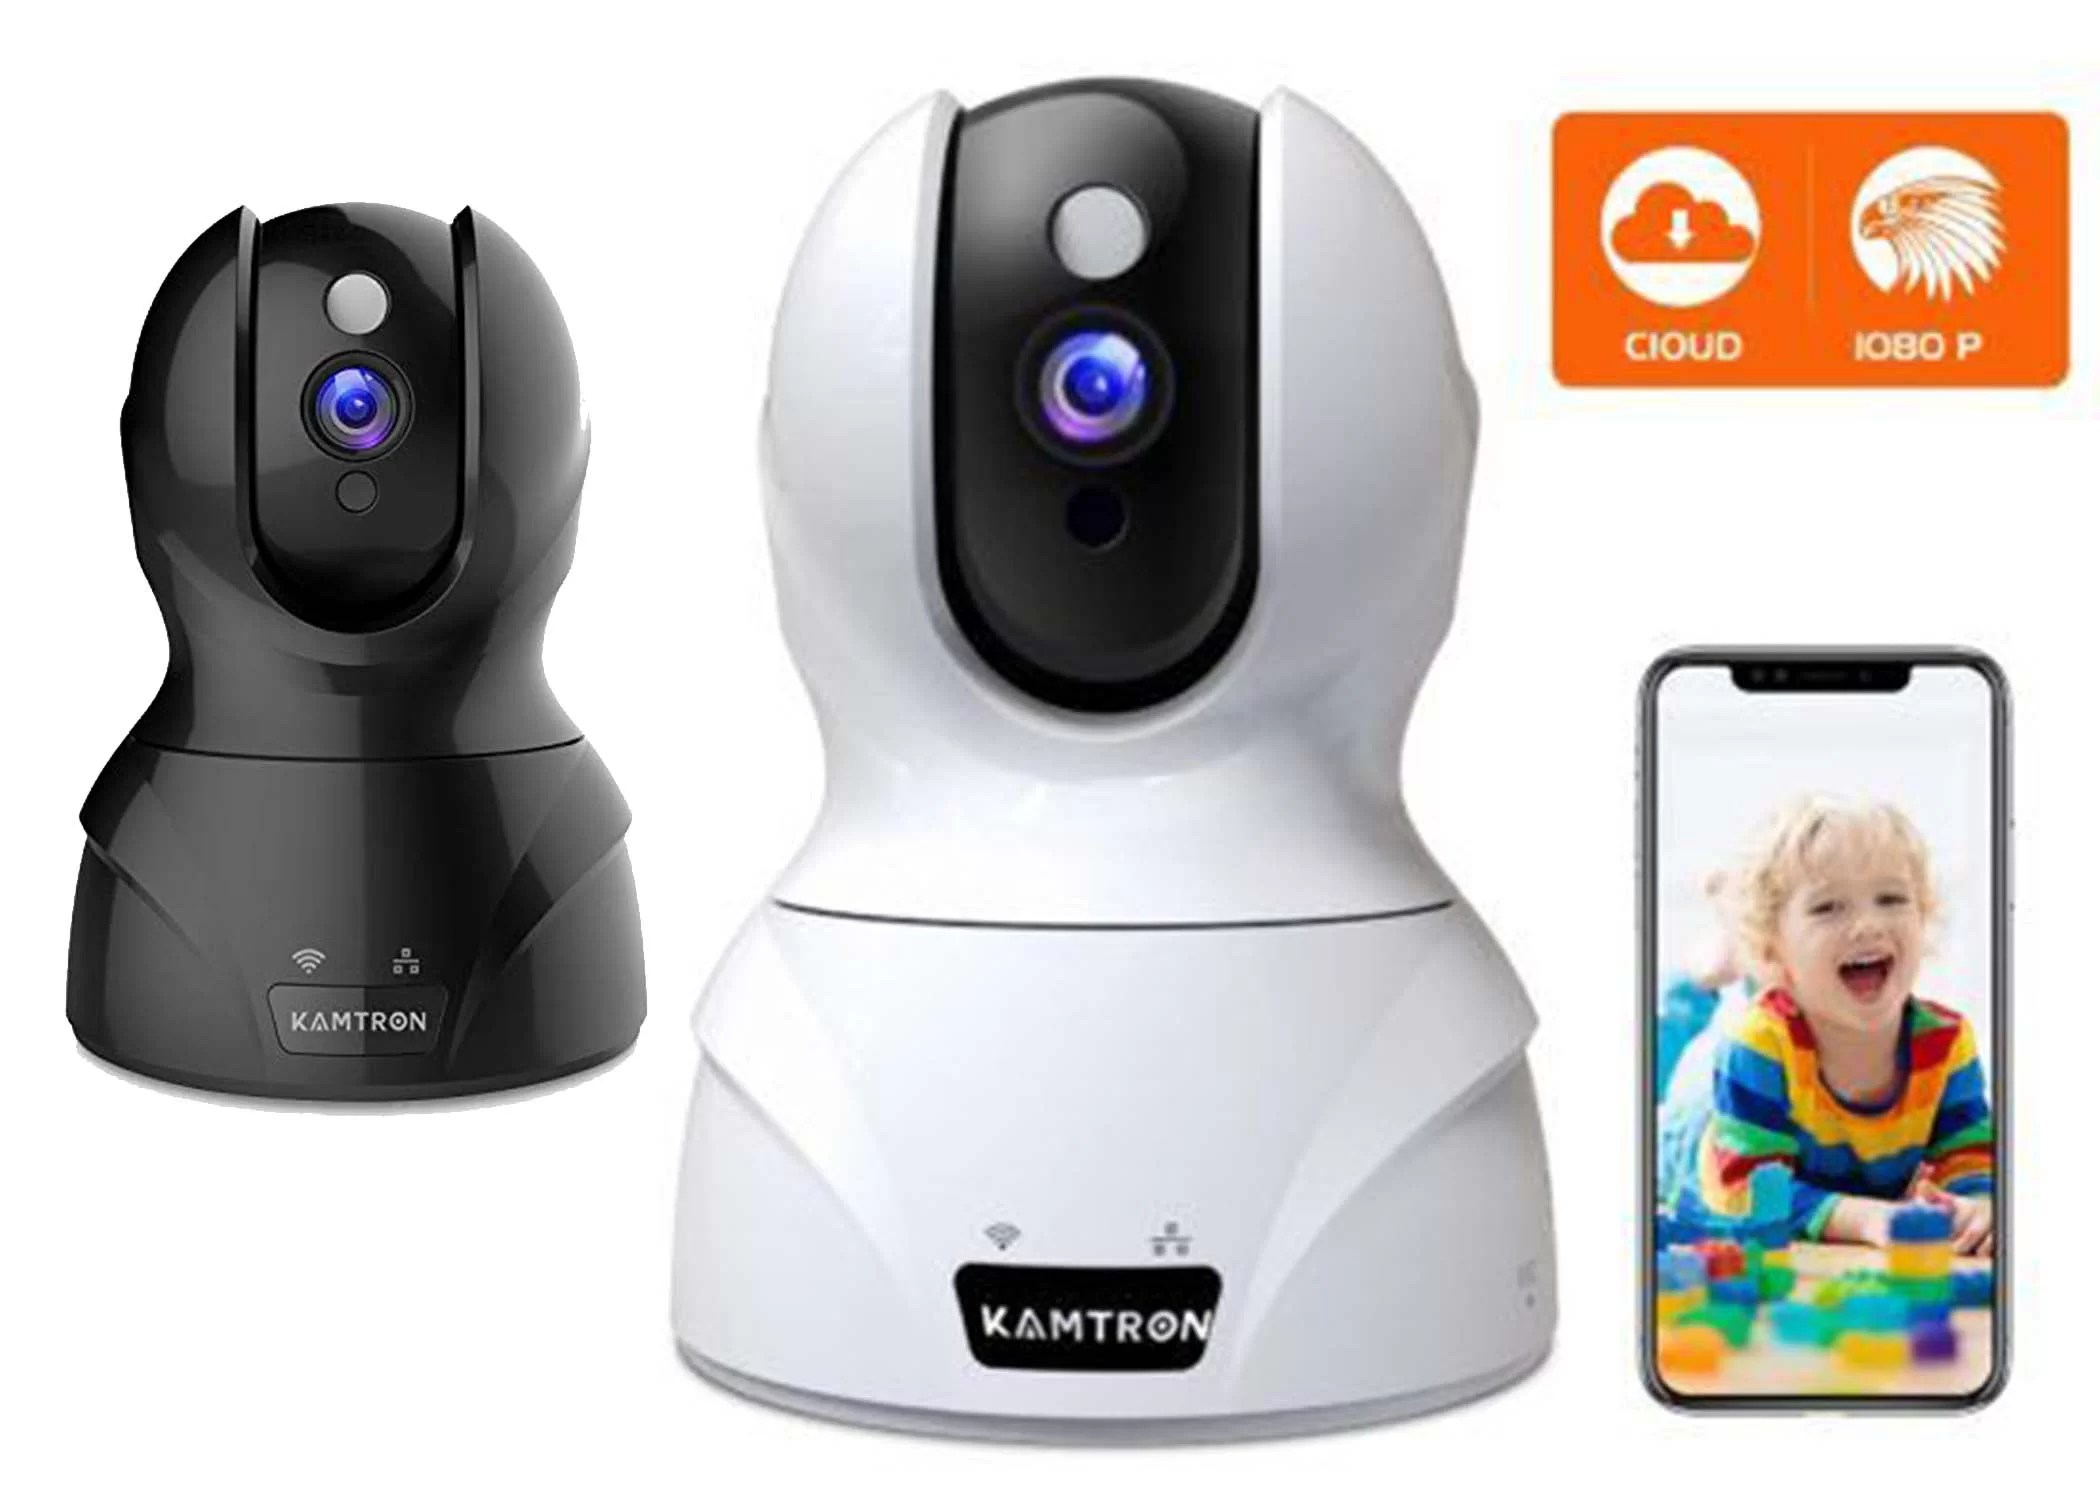 KAMTRON HD Home Wireless Baby & Pet WiFi Security Camera